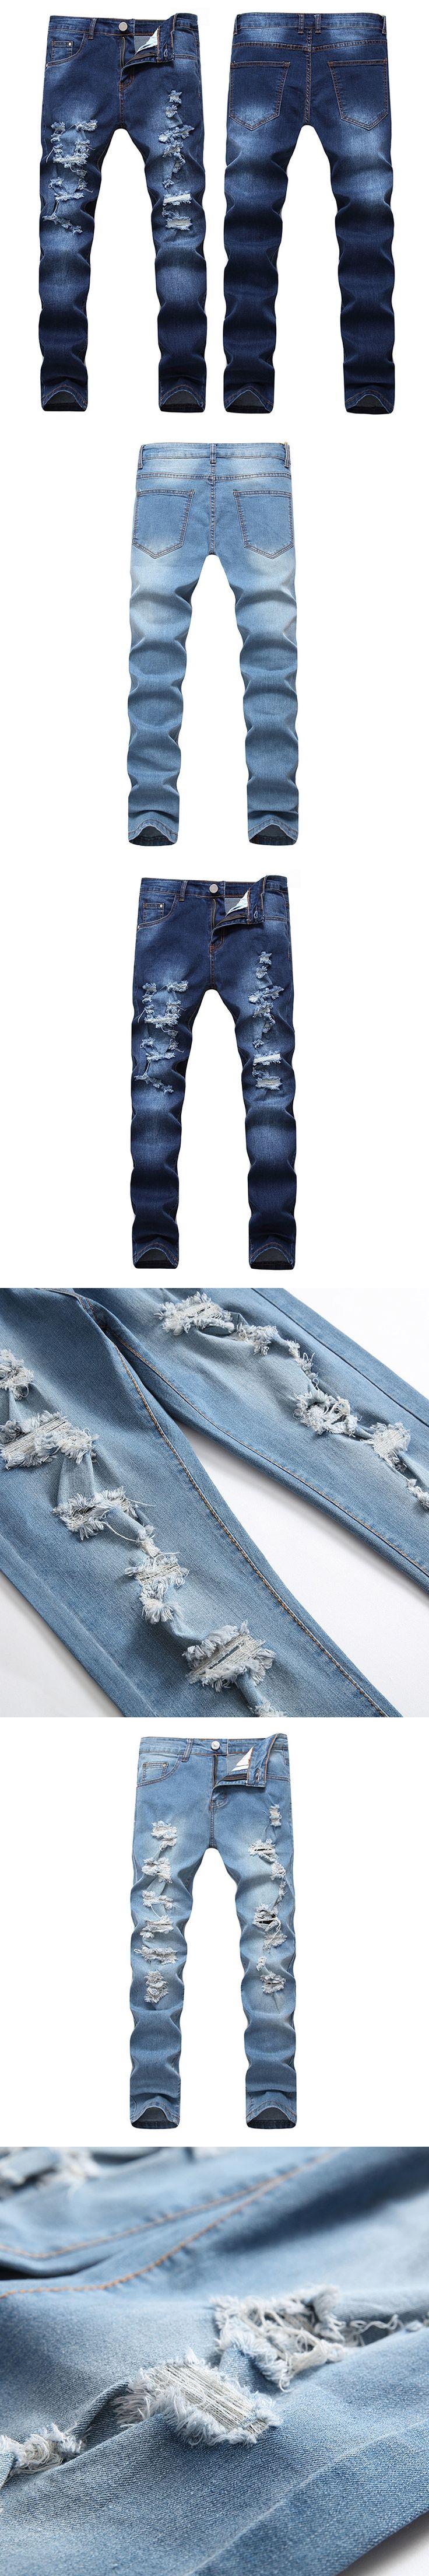 2017 New Autumn Dropshipping Biker Hole Jeans Men Long Trousers Skinny Ripped Distressed Jeans Denim Moto Pants Plus Size